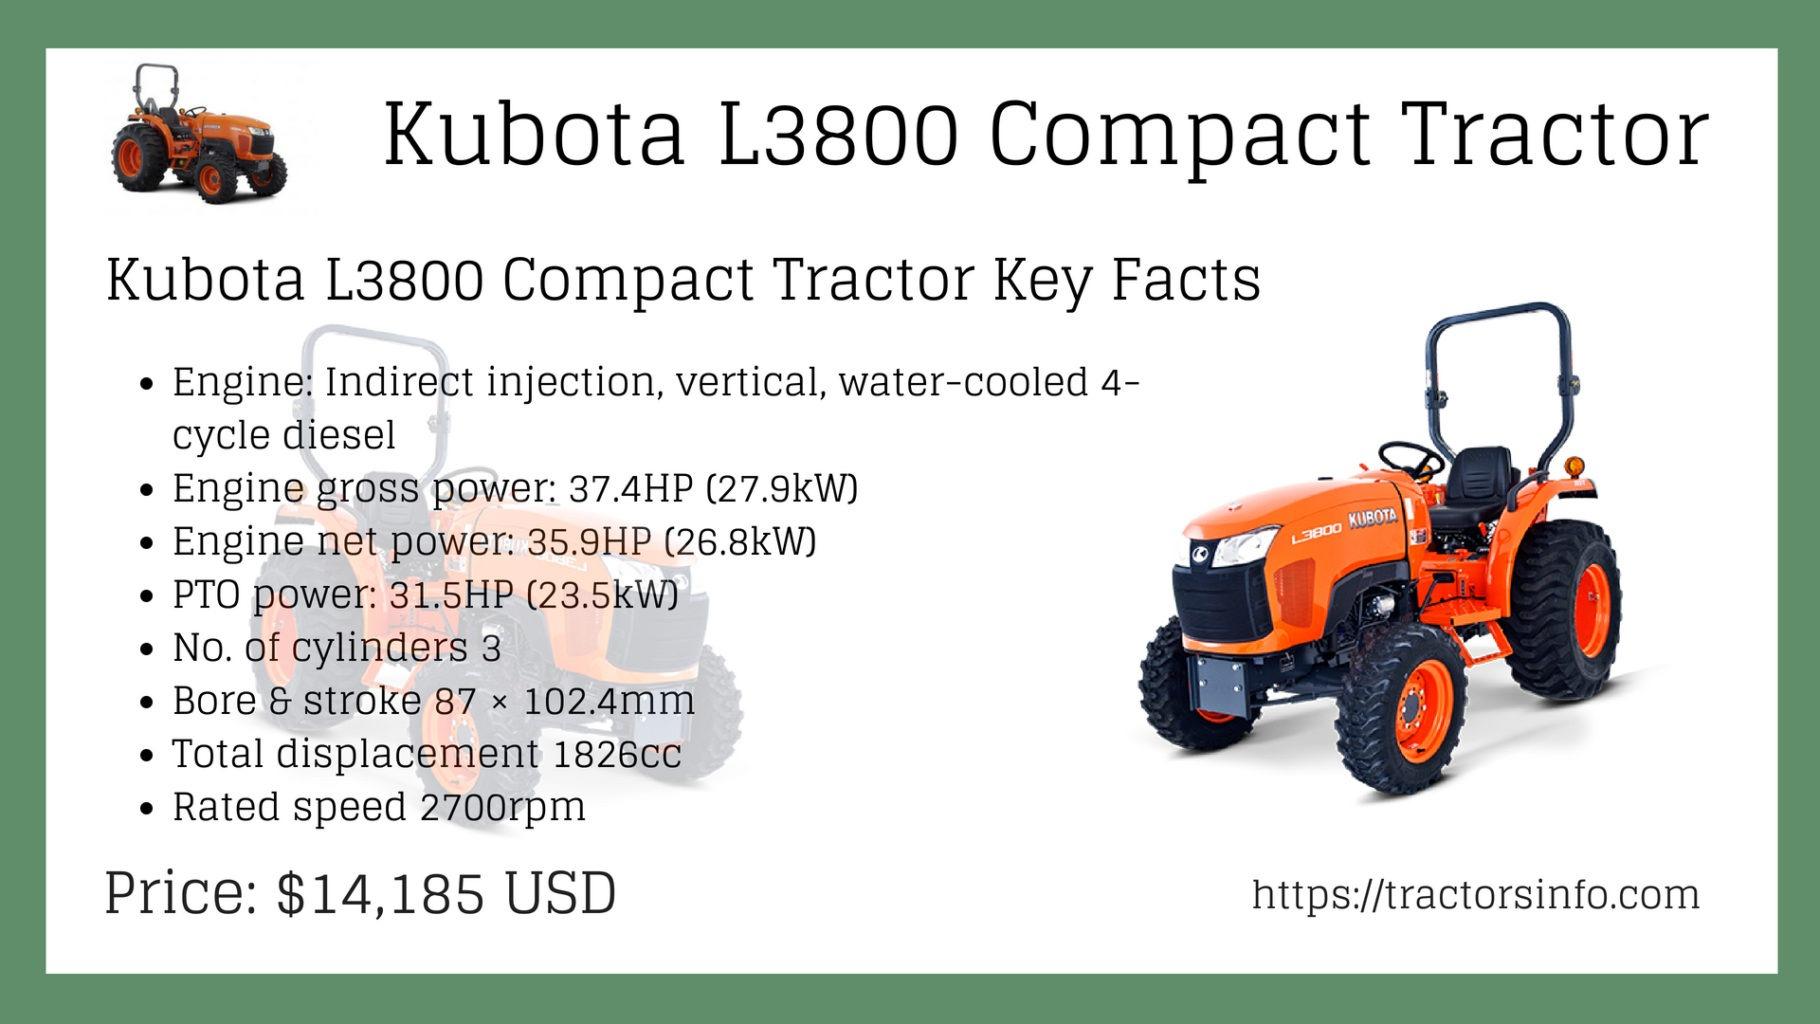 Kubota L3800 Compact Tractor